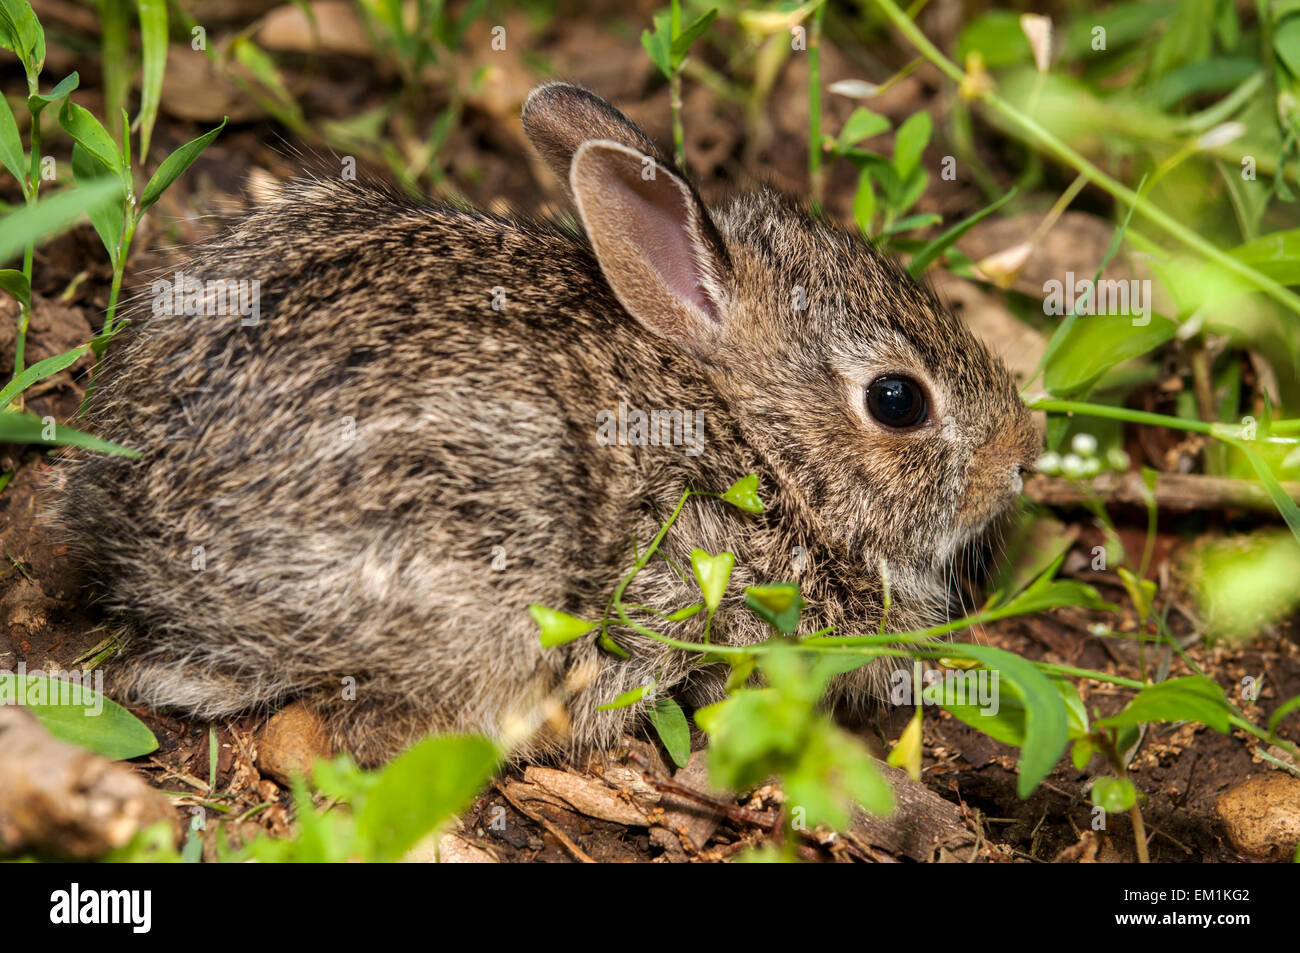 Baby bunny rabbit in grass - Stock Image